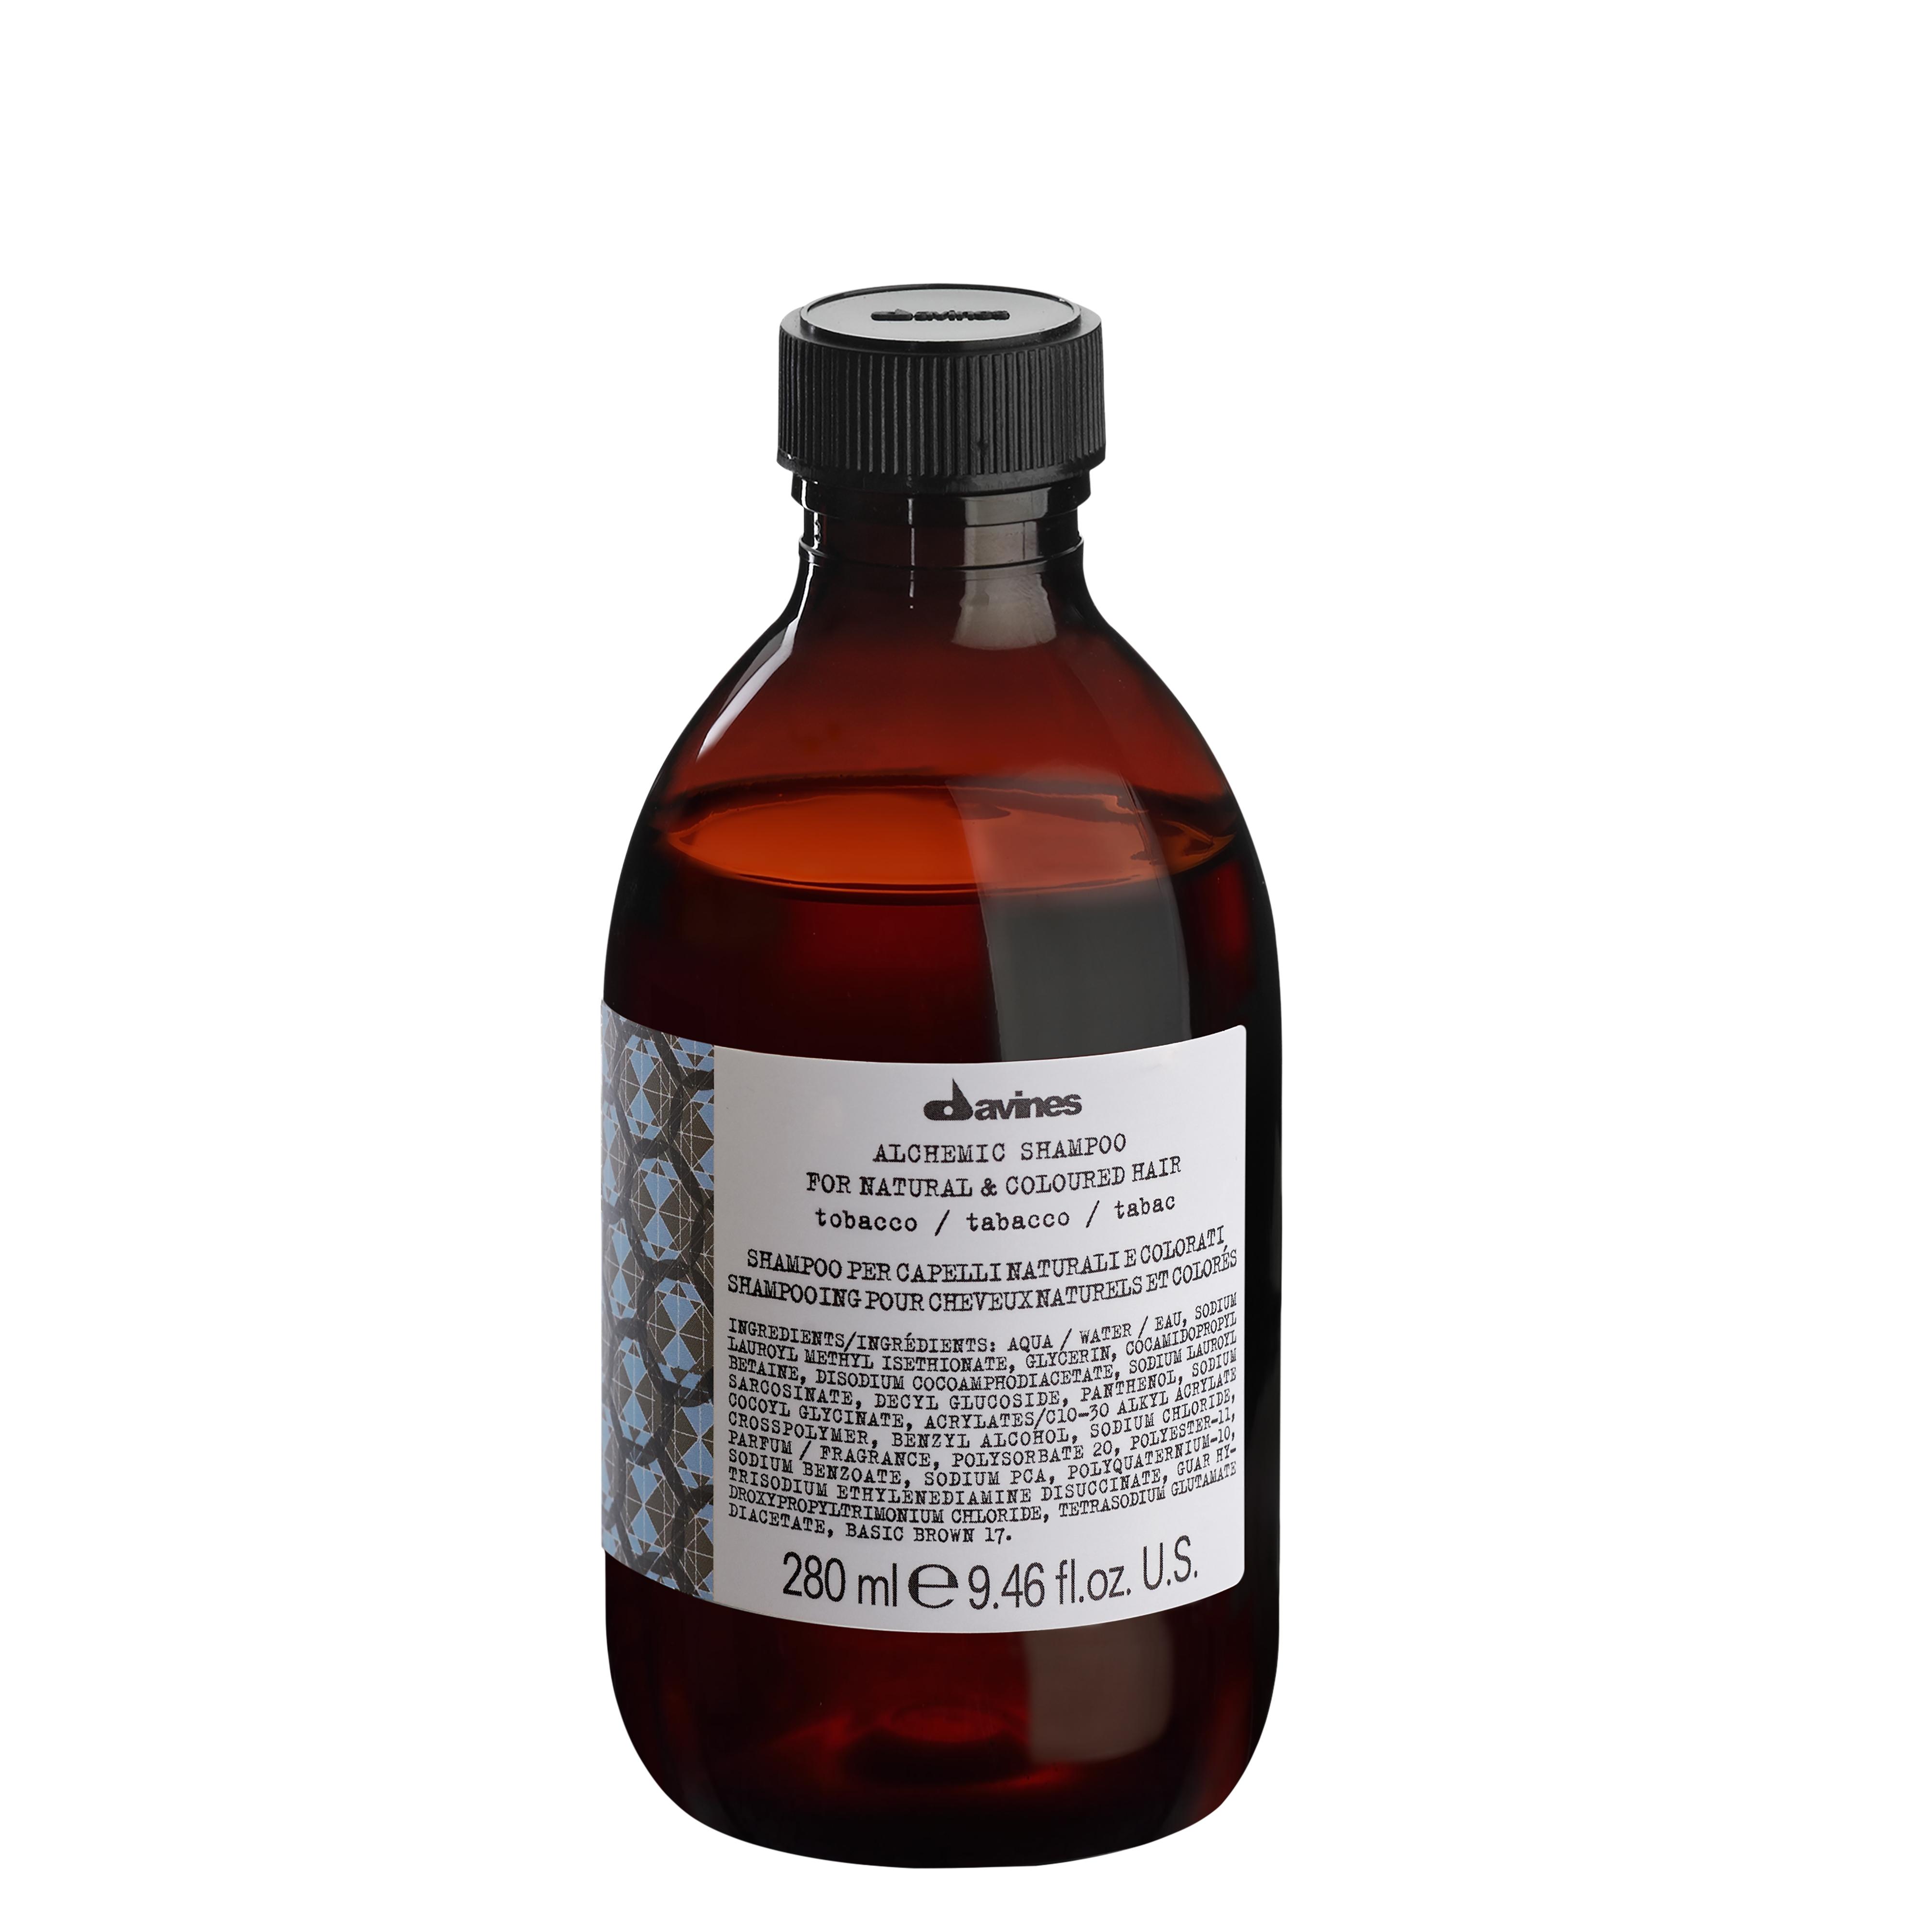 Alchemic Tobacco Shampoo 280ml